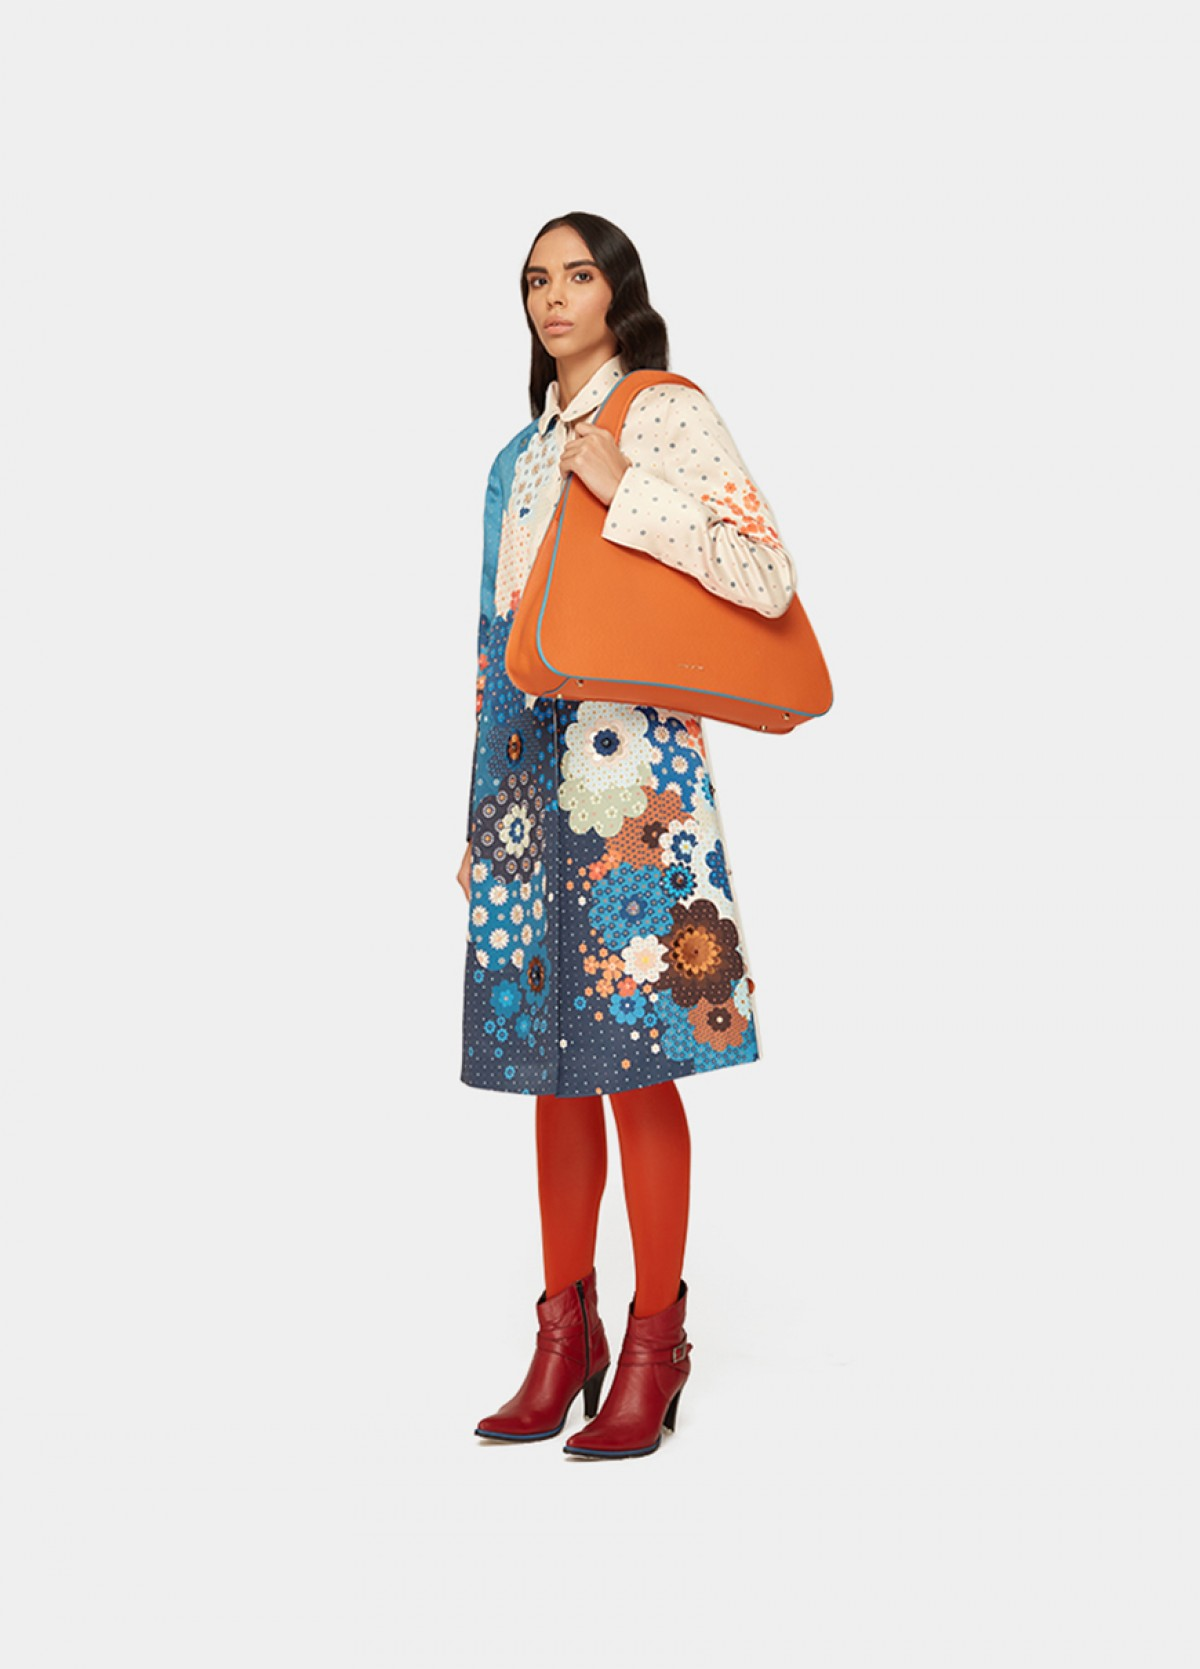 The Junga Handbag